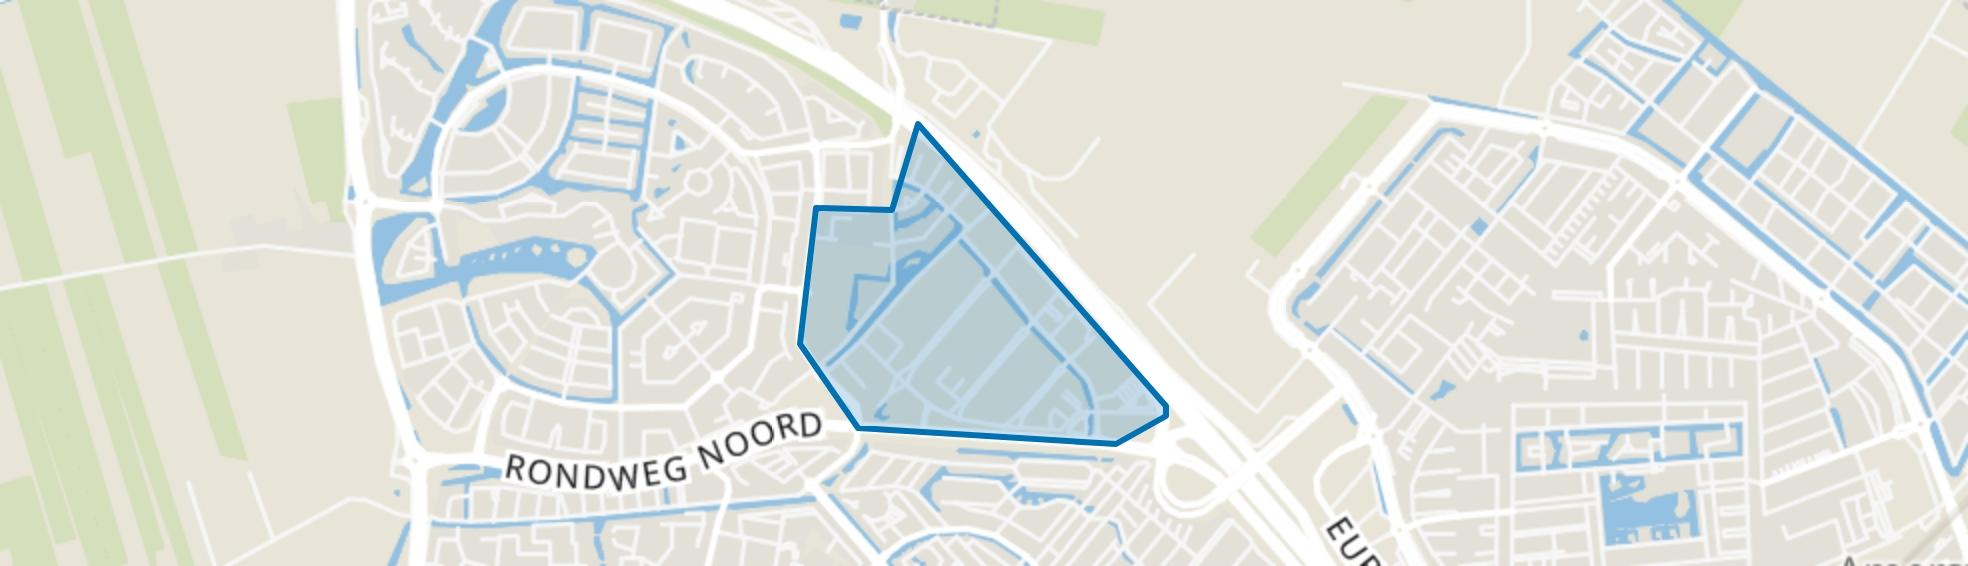 Calveen, Amersfoort map